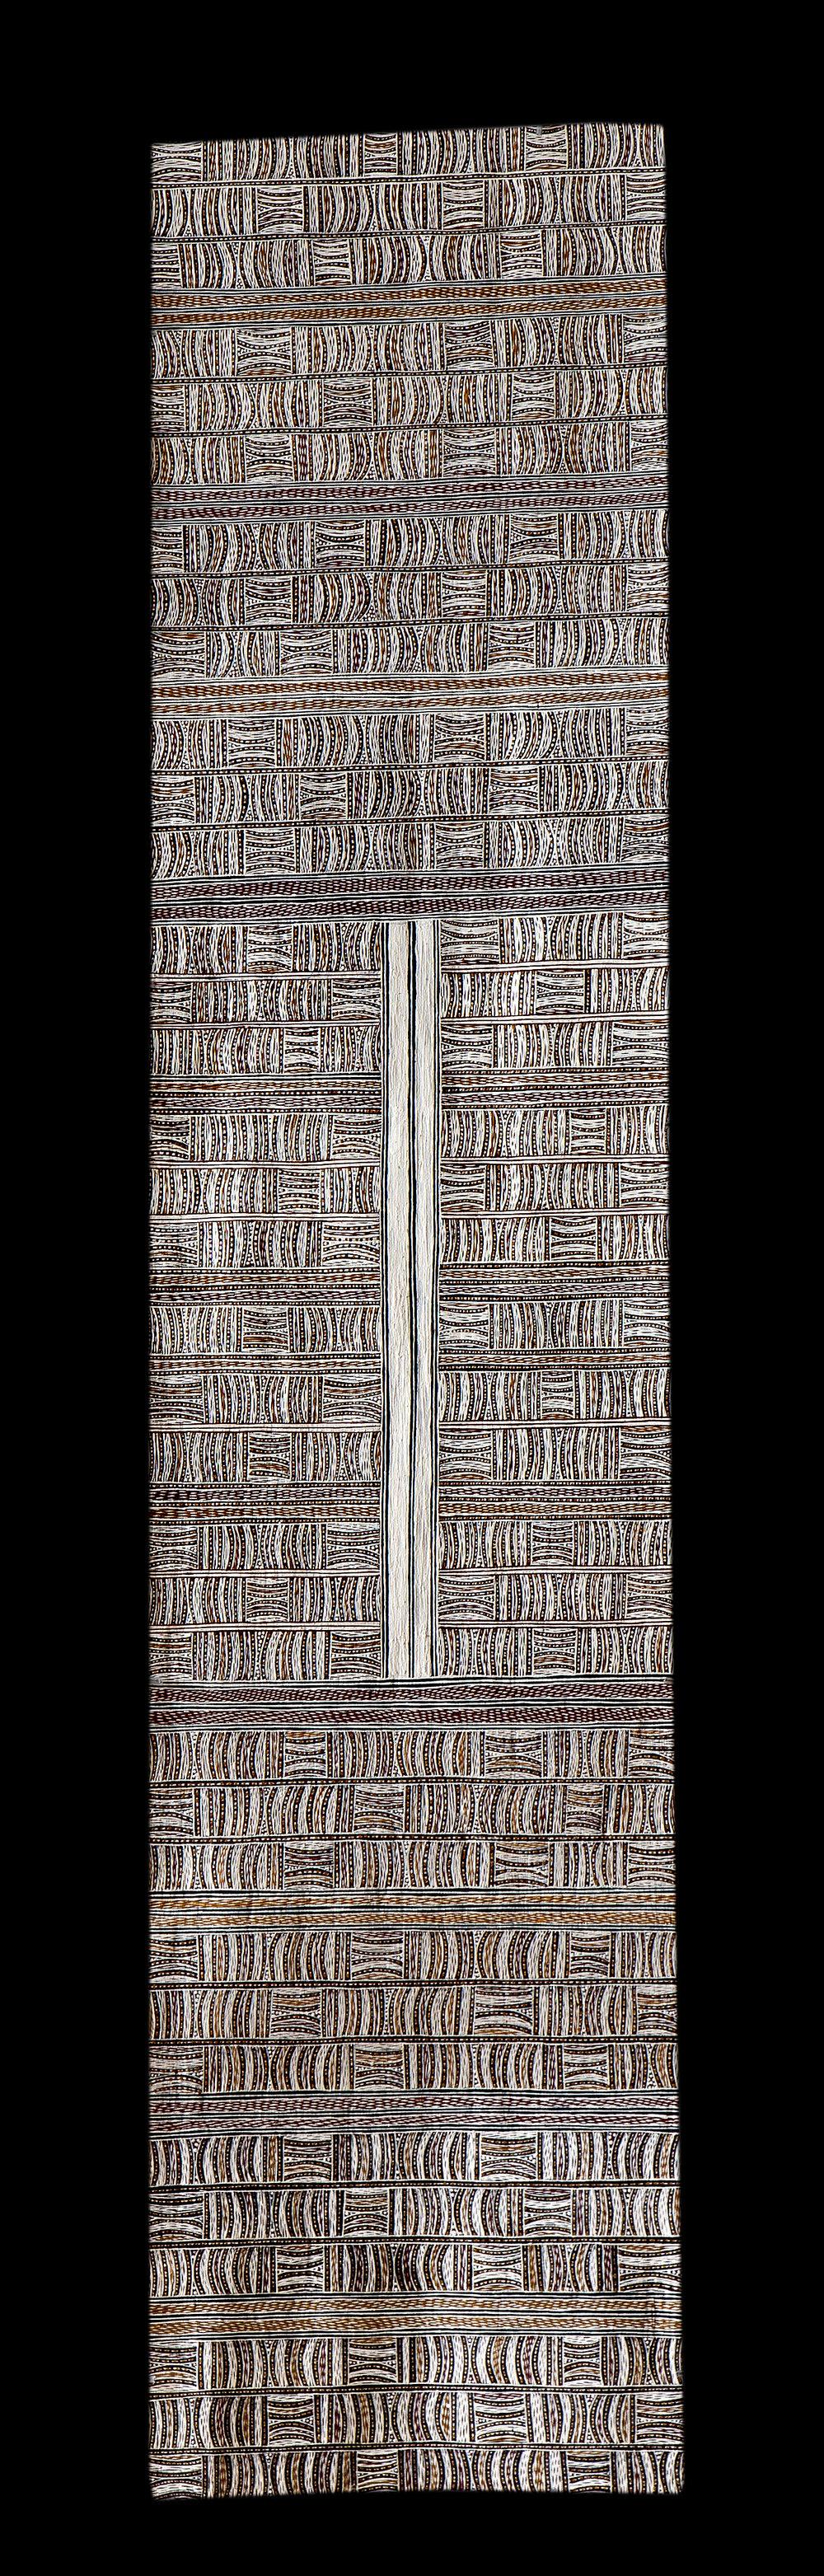 Guwaykuway Wanambi   Untitled  Natural earth pigments on bark 191 x 43cm  Buku Larrnggay Mulka #3979Z   EMAIL INQUIRY